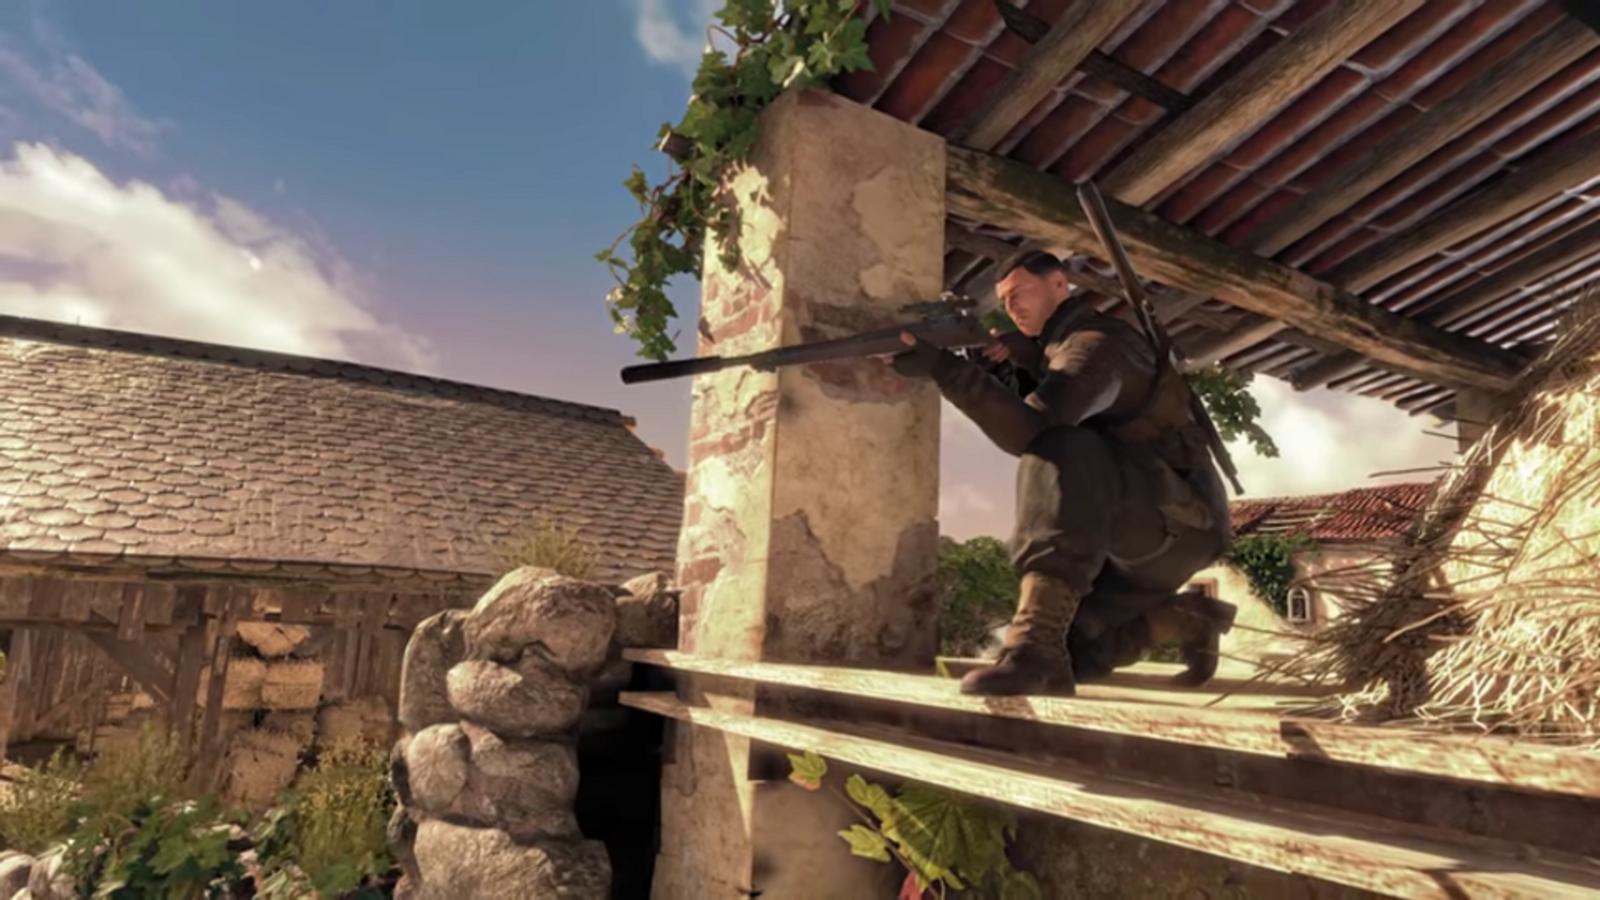 Sniper elite 4 review sniper elite 4 3 sniper elite 4 review voltagebd Images